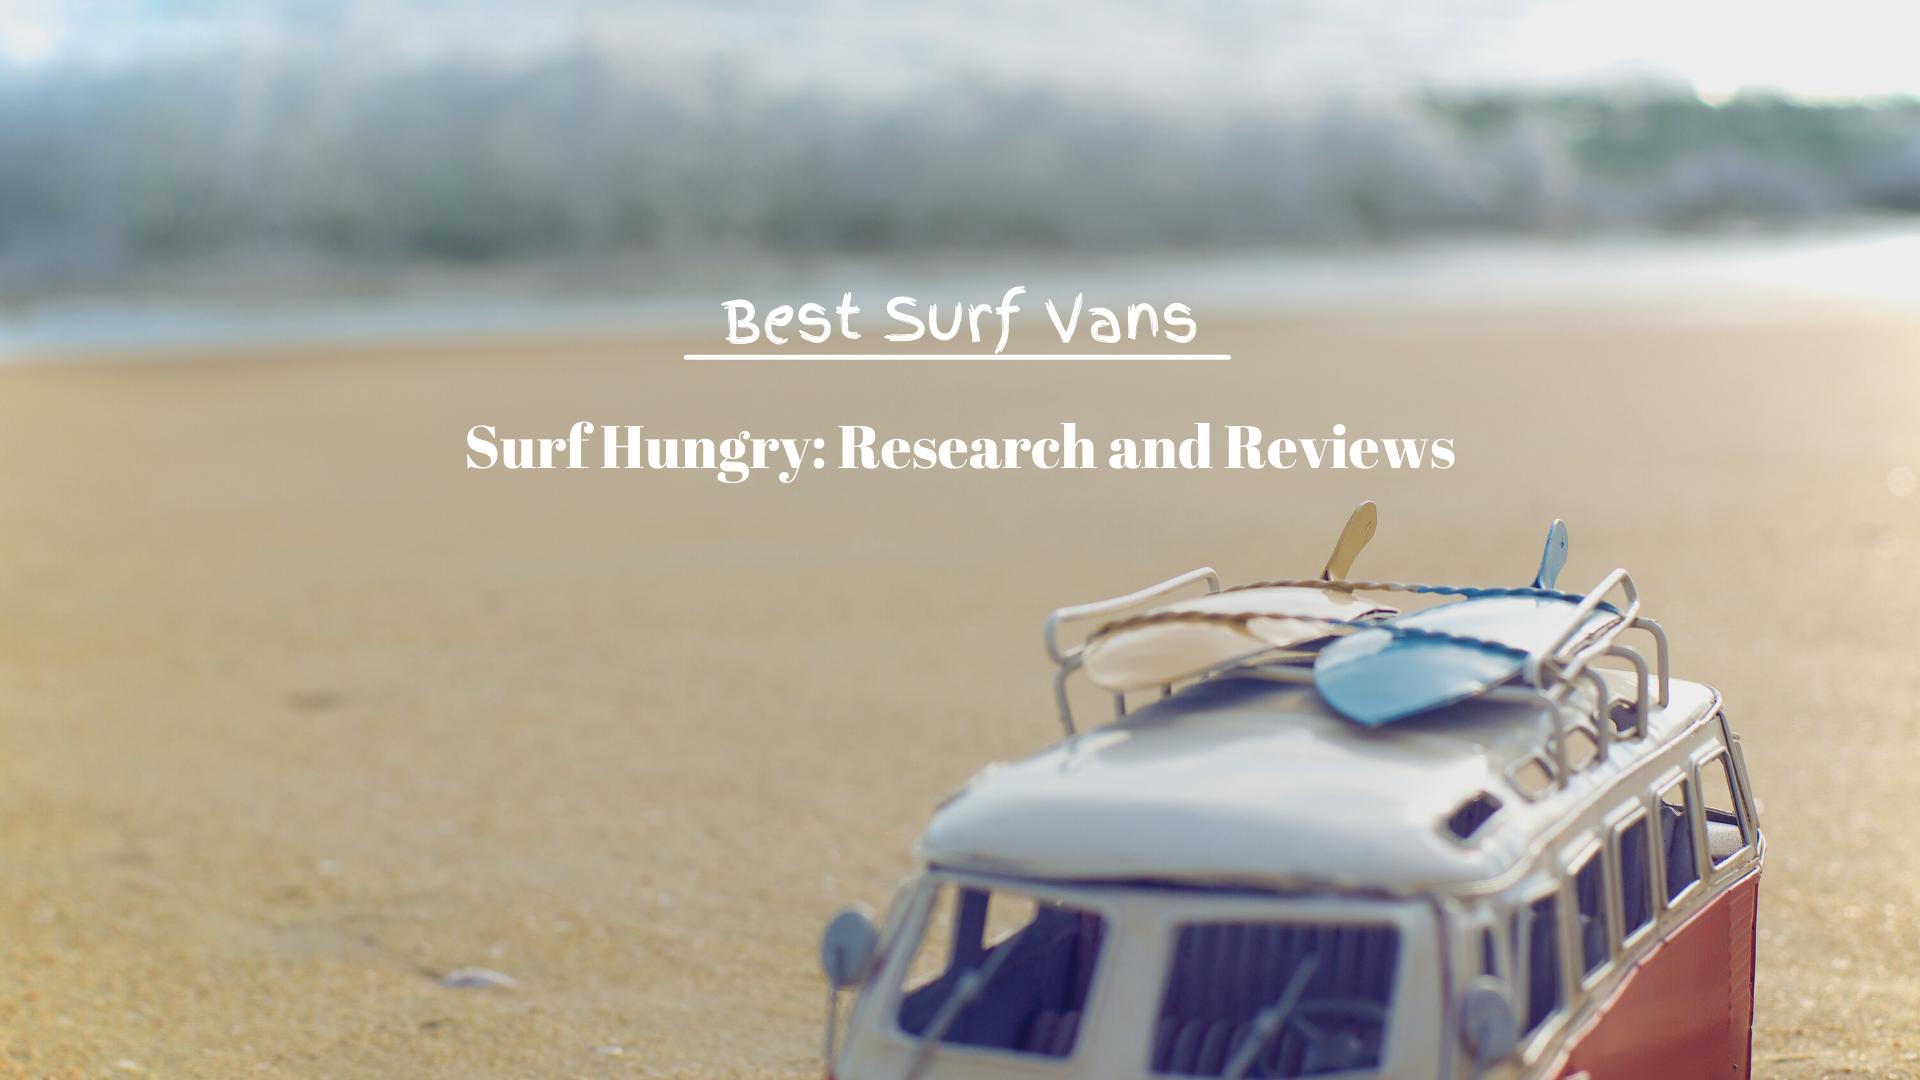 Best Surf Vans